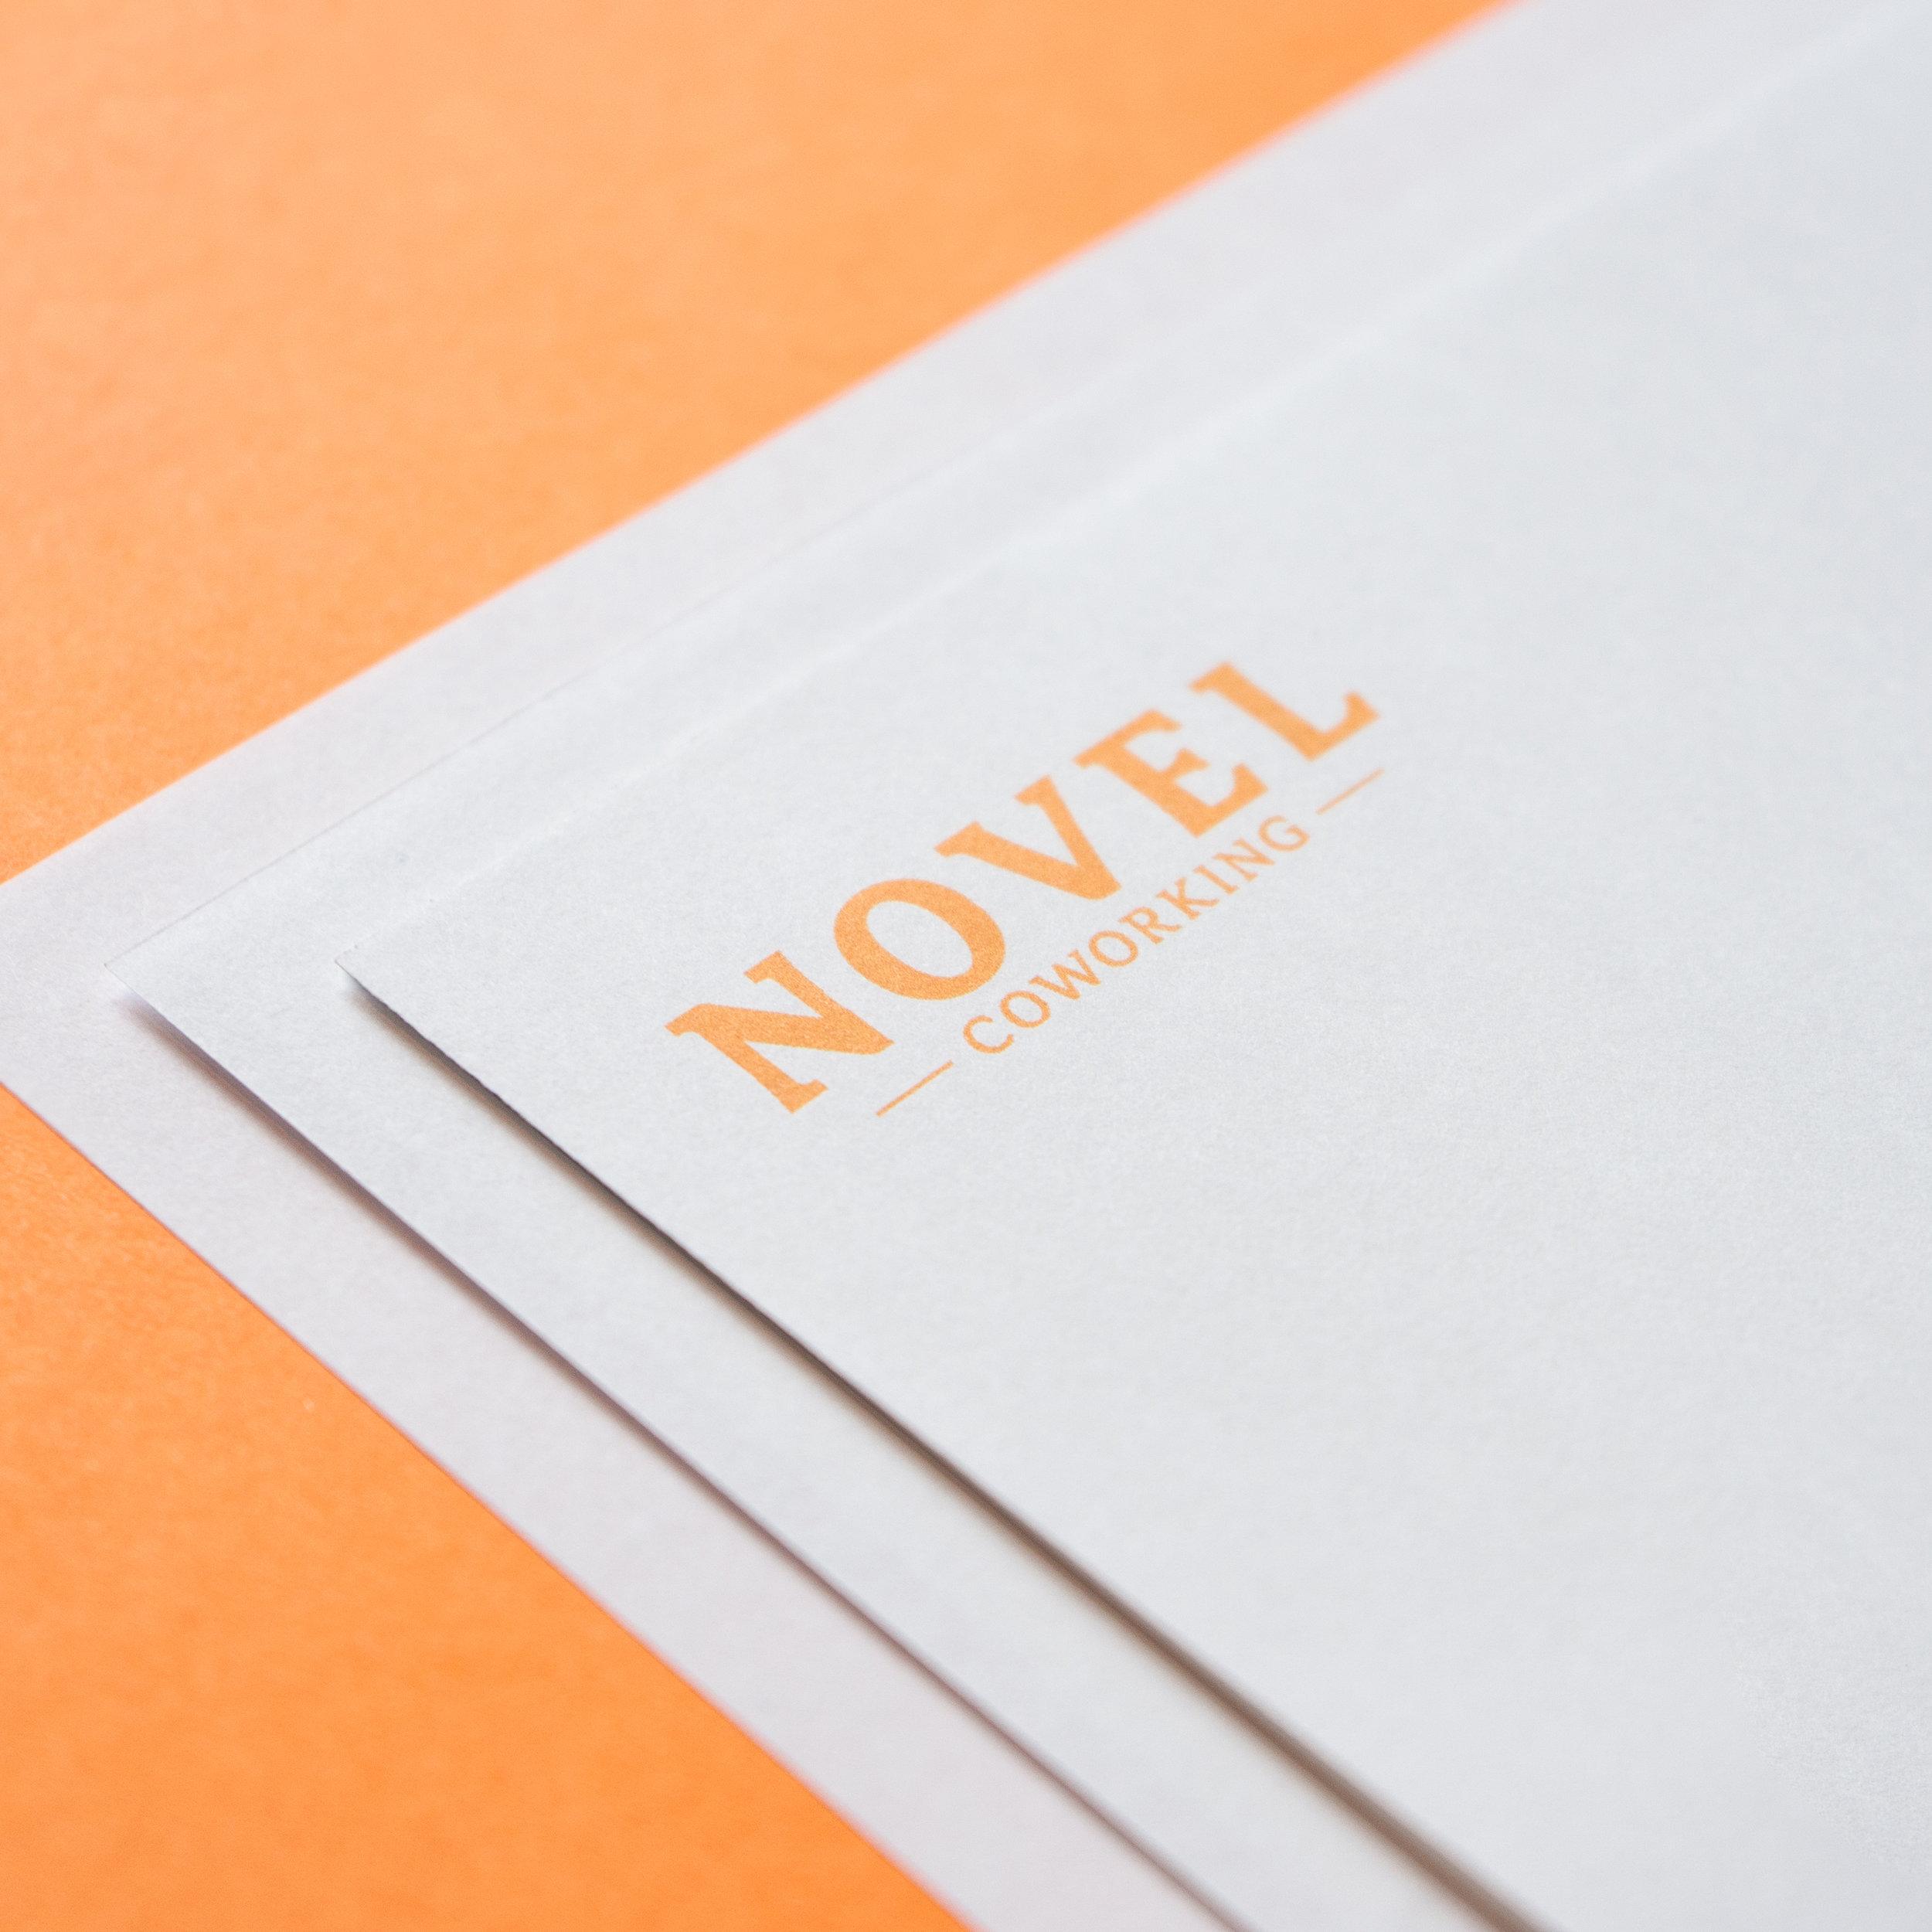 Novel_Thumb.jpg